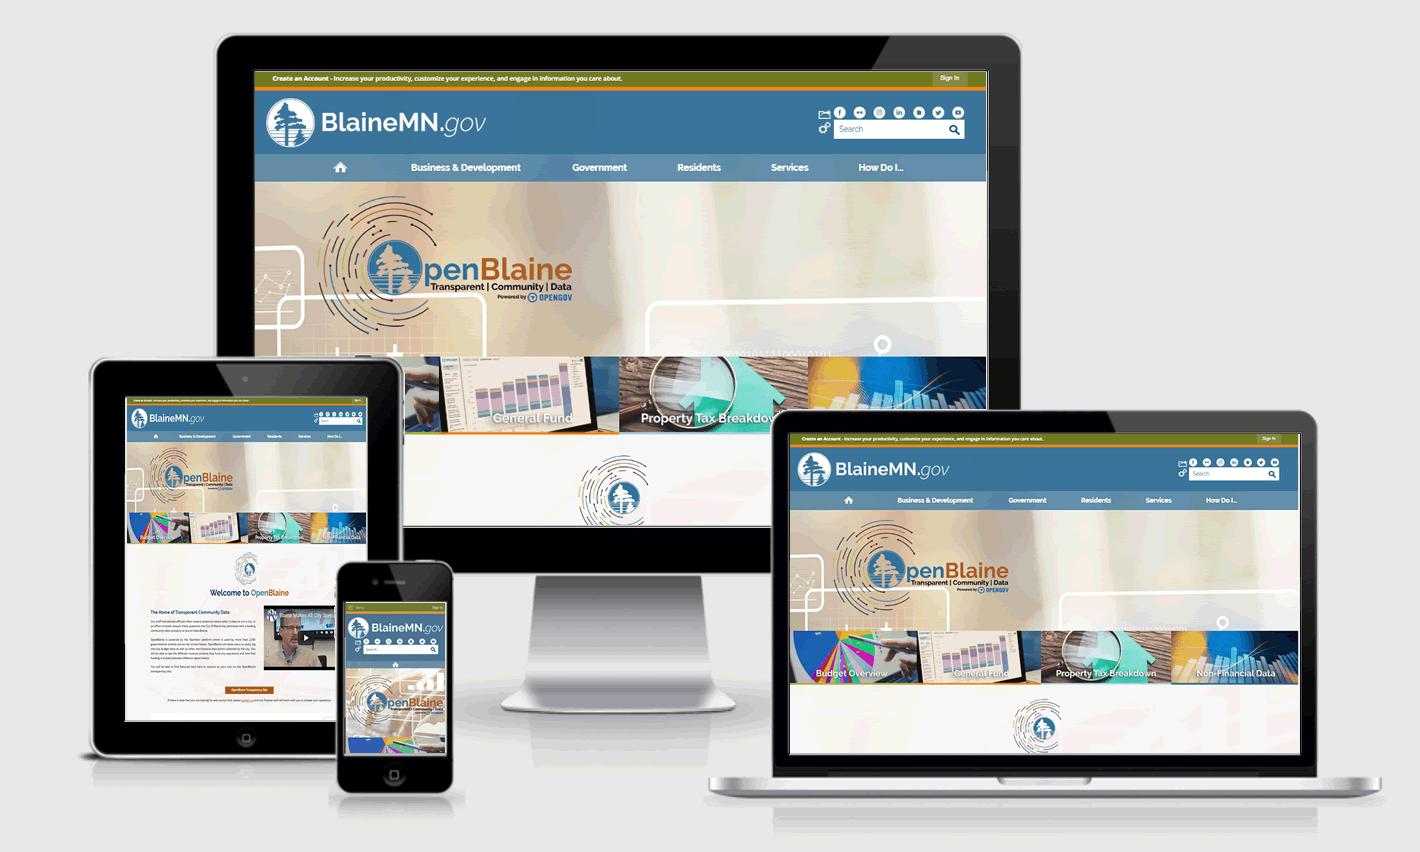 OpenBlaine Responsive Website Design